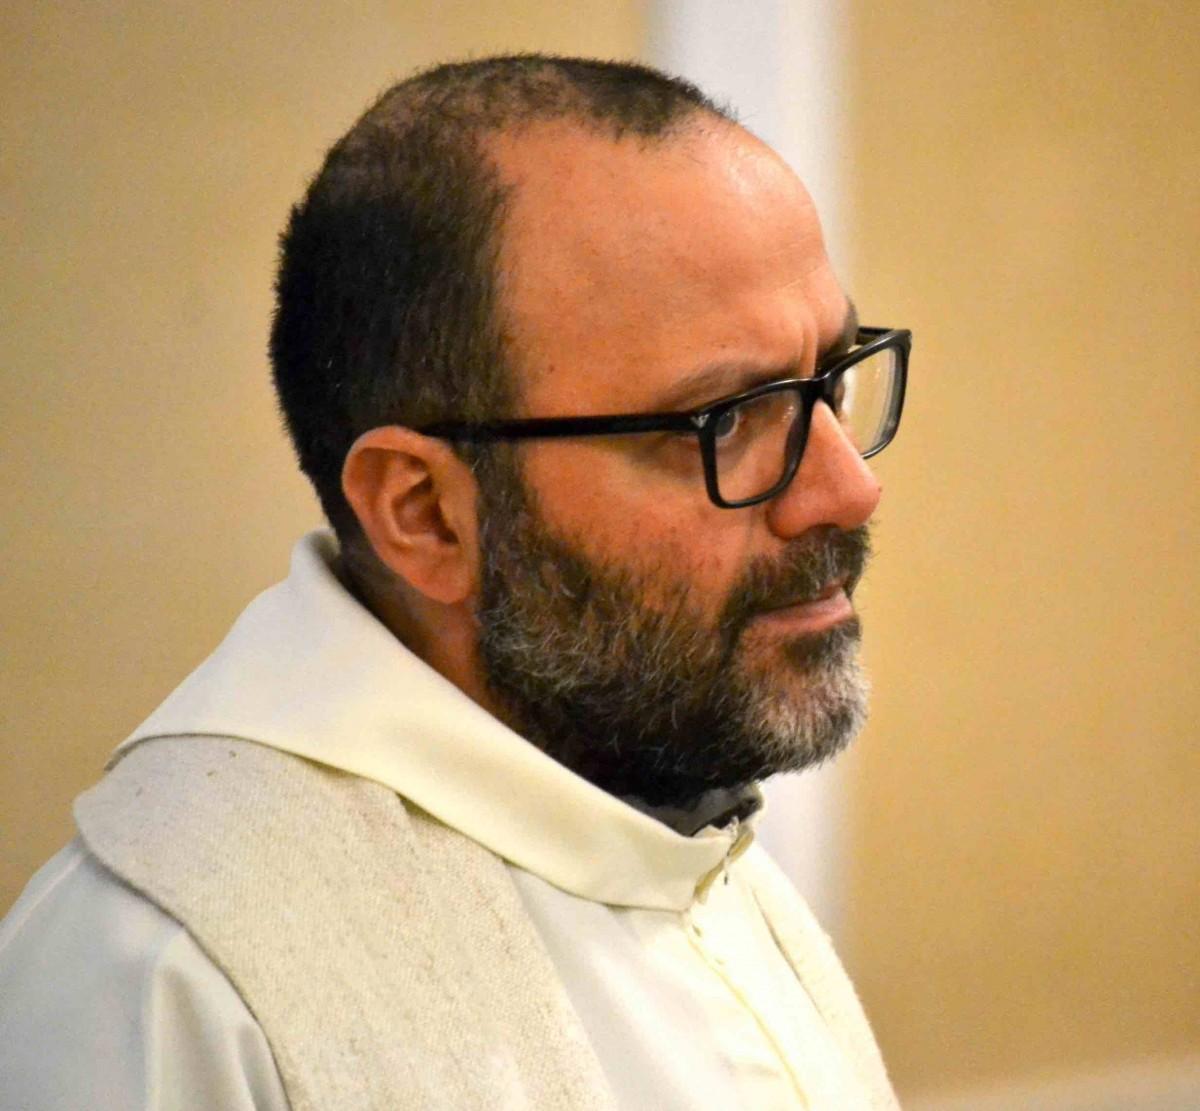 fr. Gianluca Savarese